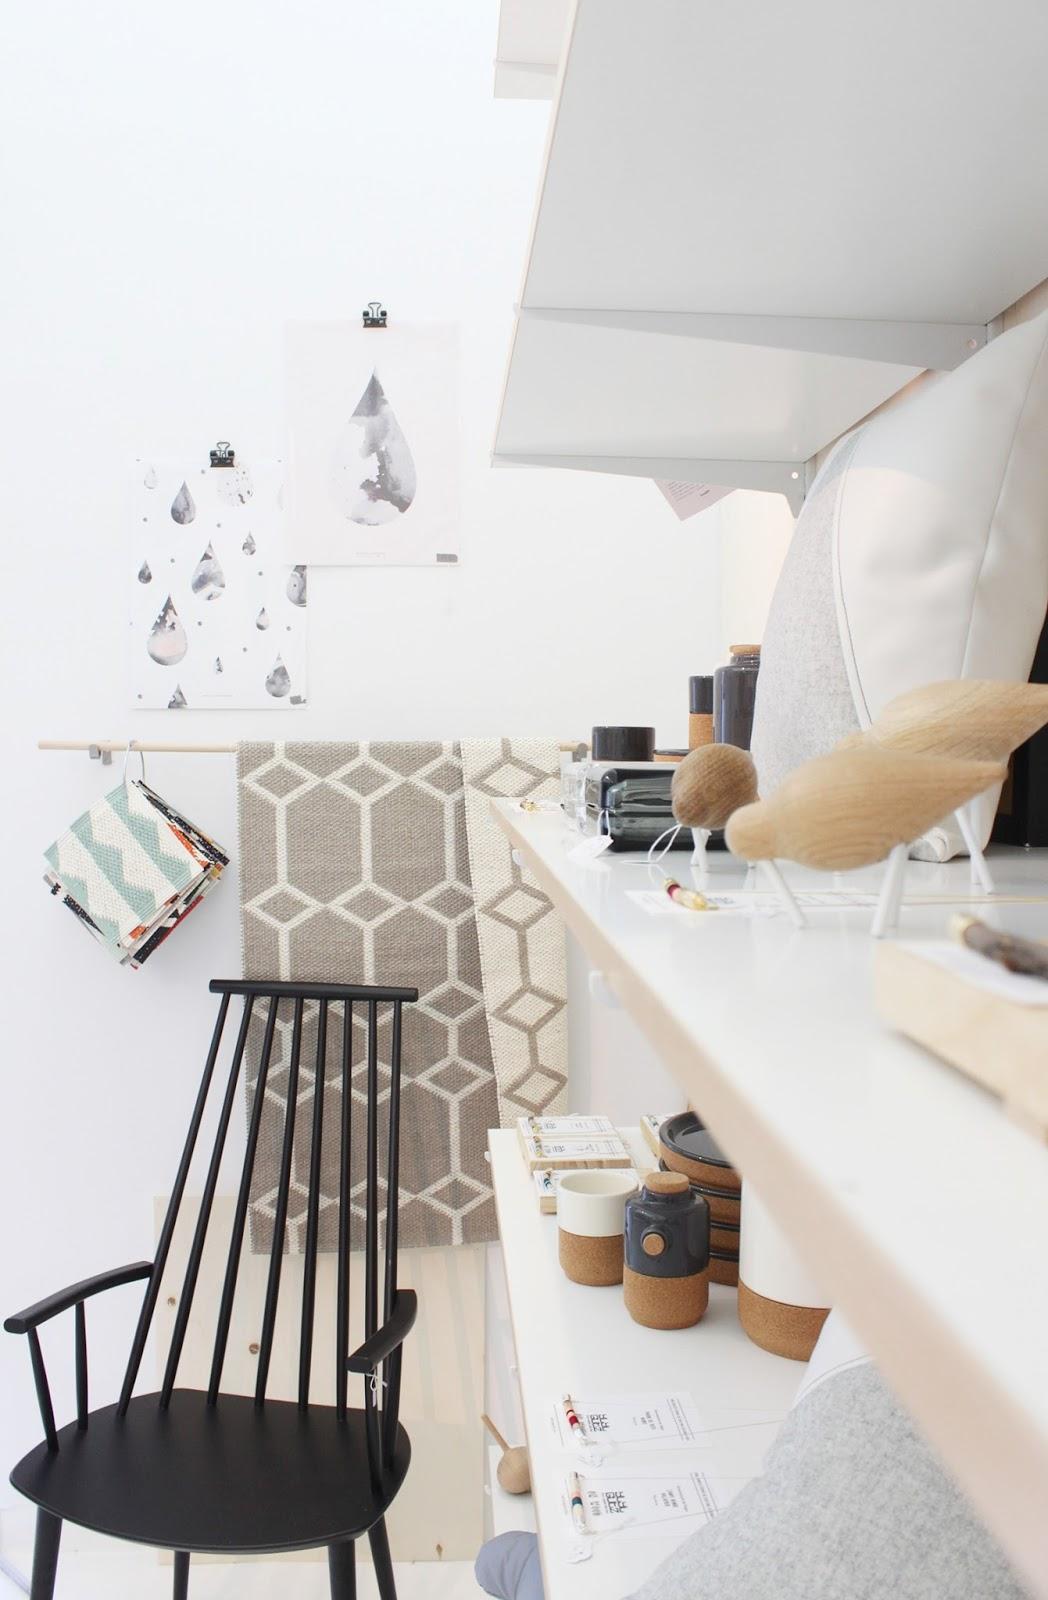 deleite-design-tienda-calle-castelló-5-madrid-02